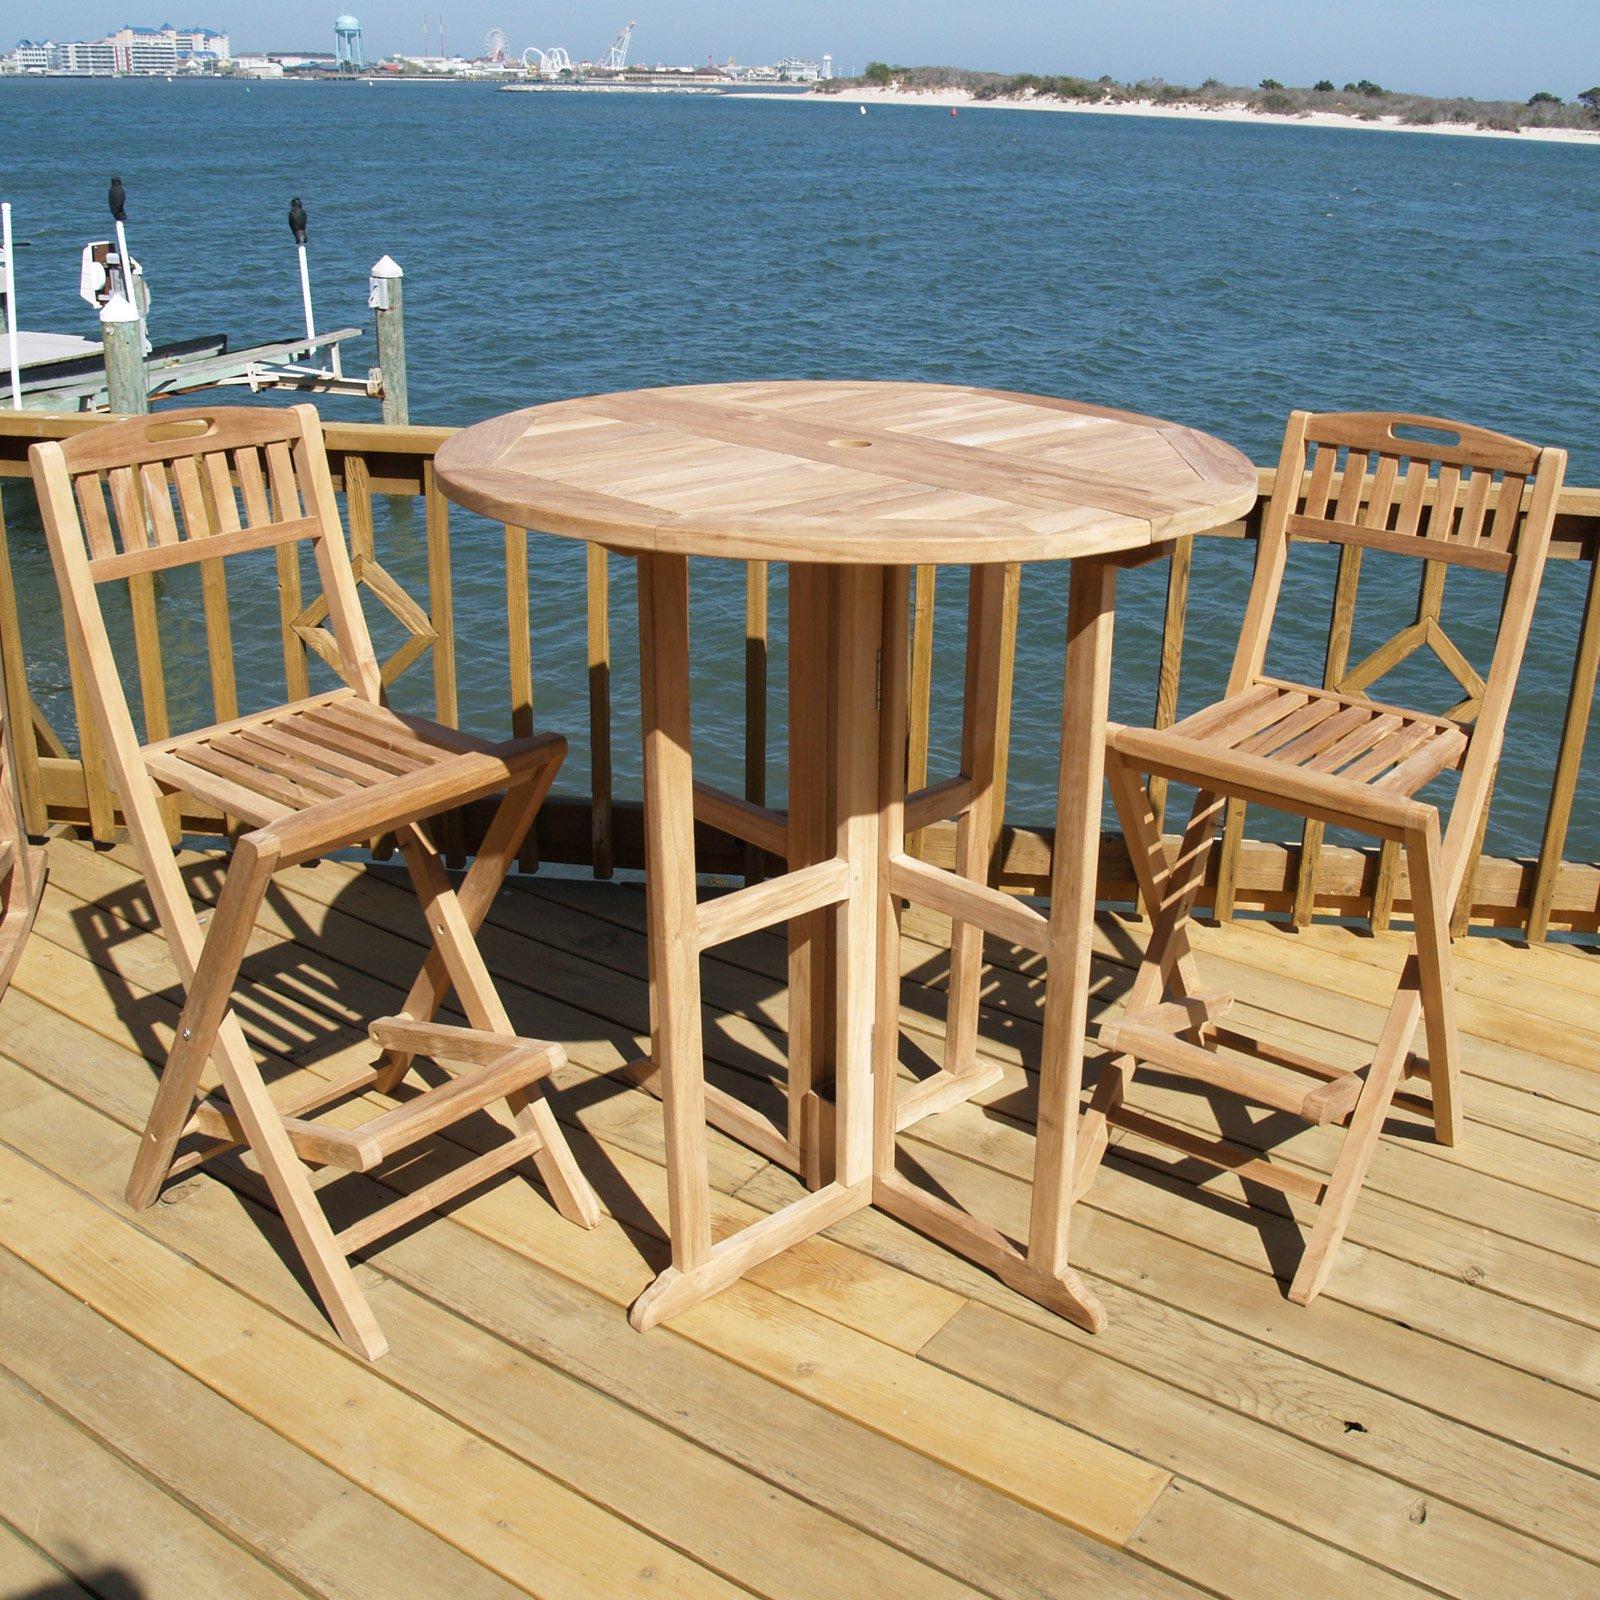 Windsor Teak Furniture Teak Wood 3 Piece Bar Height Patio Dining Room Set by Windsor Teak Furniture